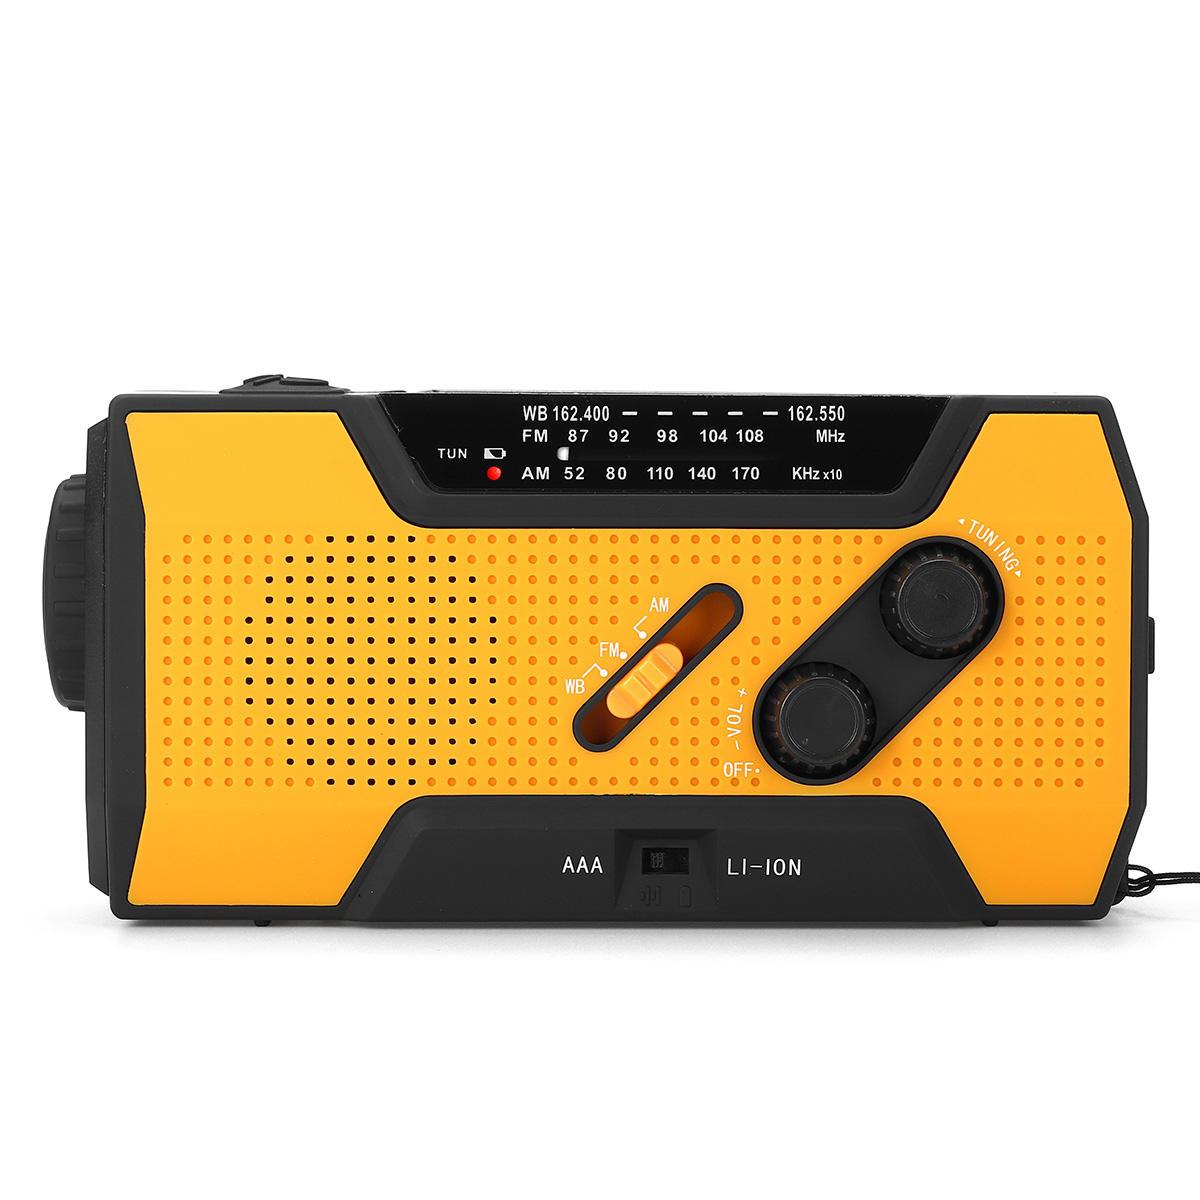 0afec2d16d6 Portable AM FM NOAA Radio Solar Crank Emergency Weather Flashlight  Rechargeable Power Bank for iPhone - Orange COD